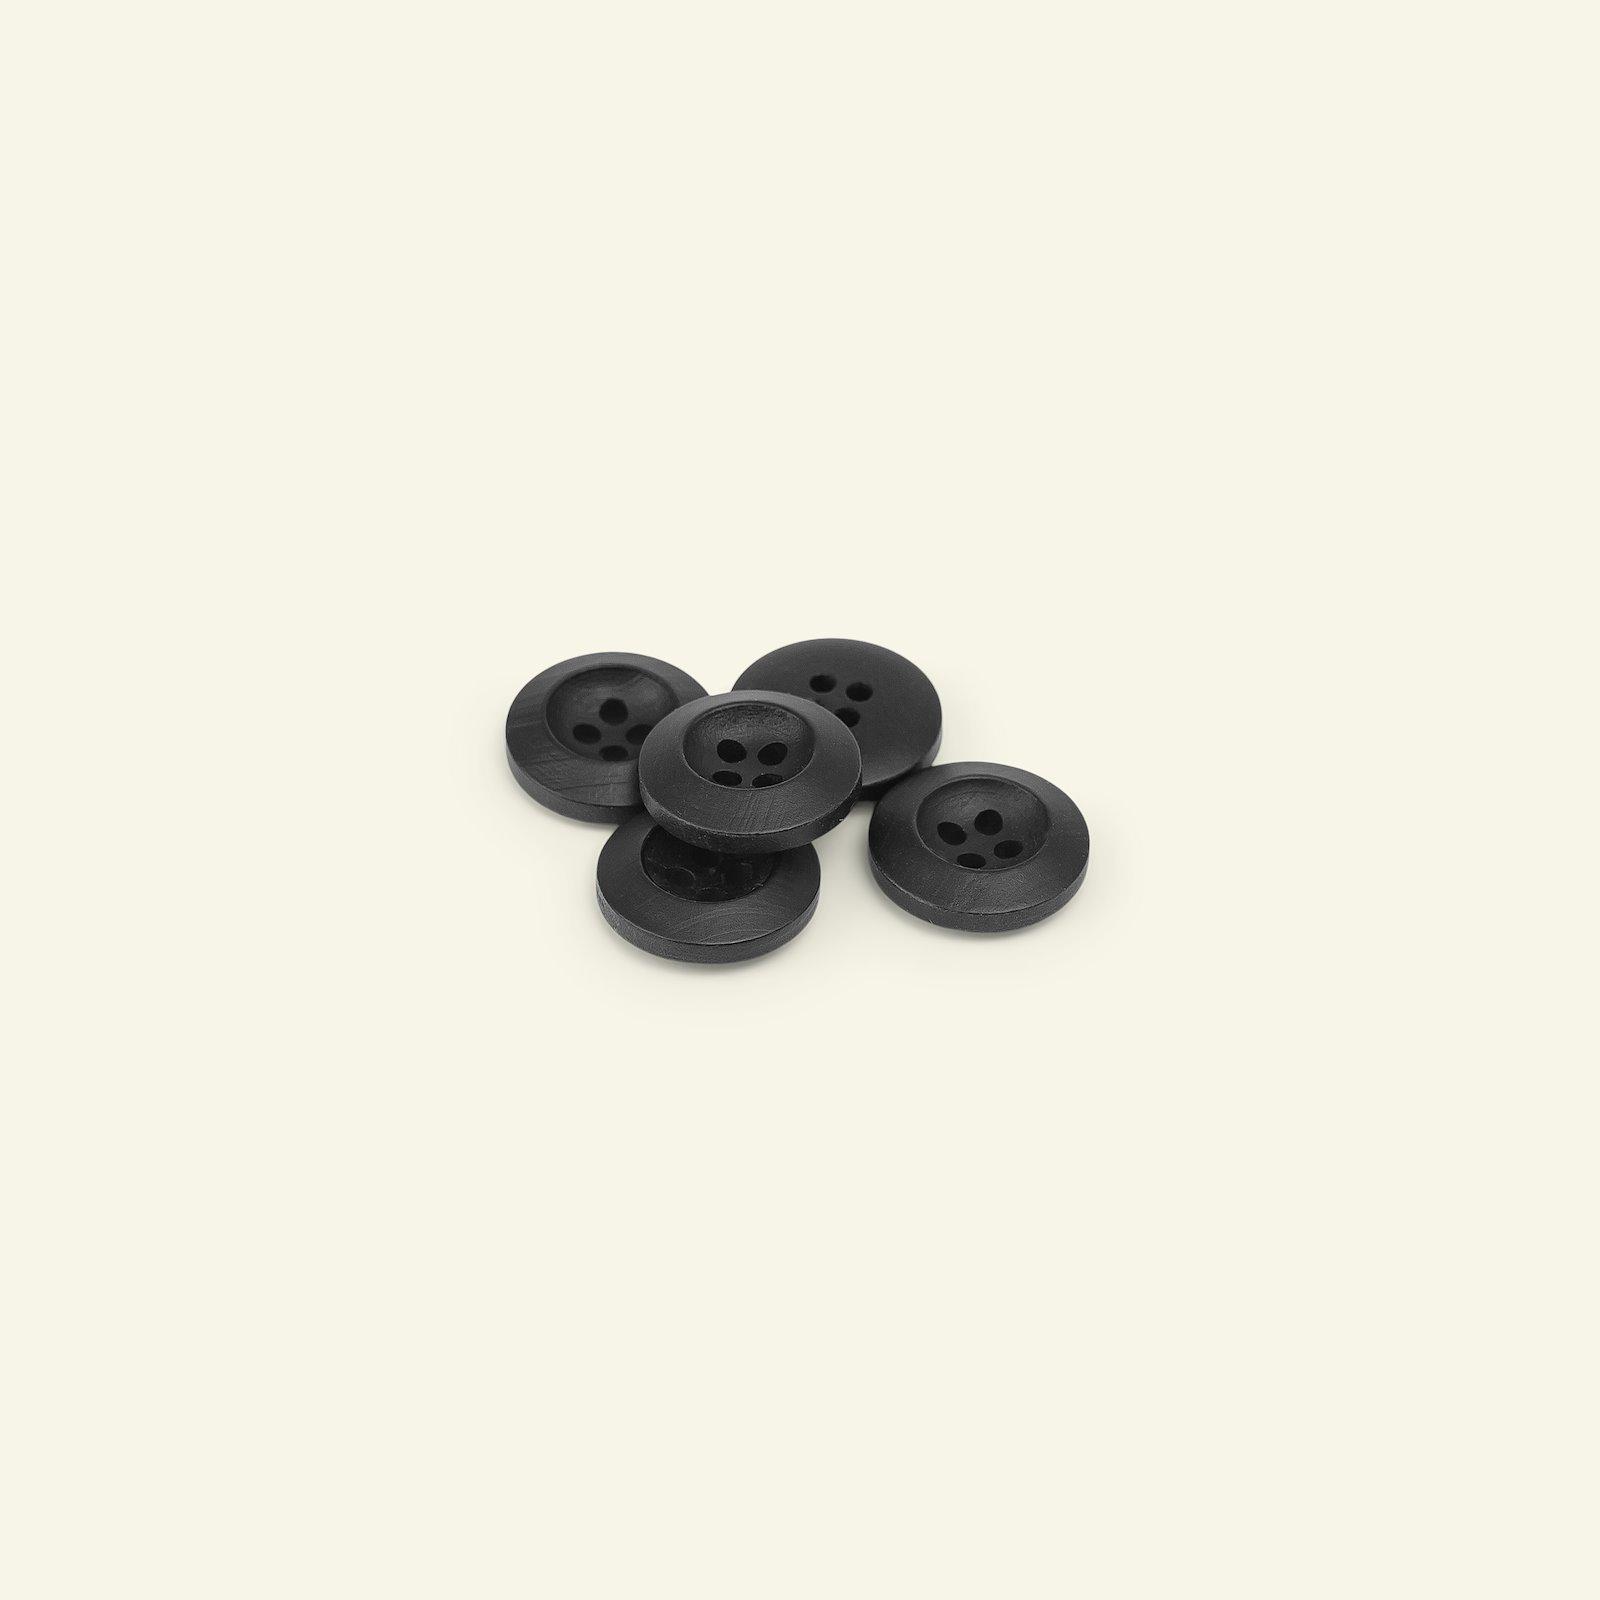 Button 4-holes wood look 15mm black 5pcs 33179_pack